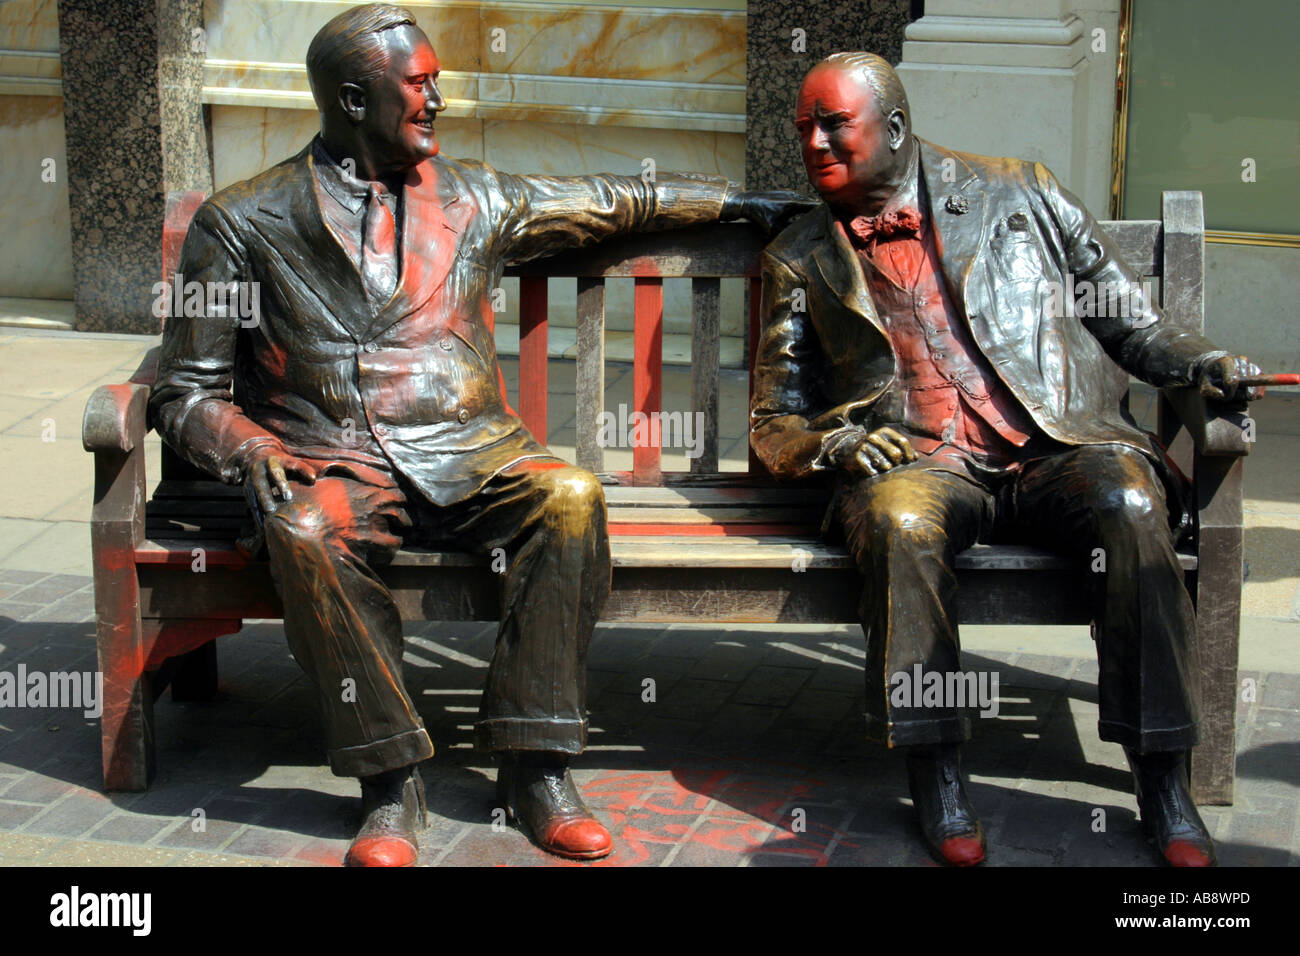 Paint vandalized Bronze sculptures of FD Roosevelt and Winston Churchill on bench New Bond Street London UK - Stock Image